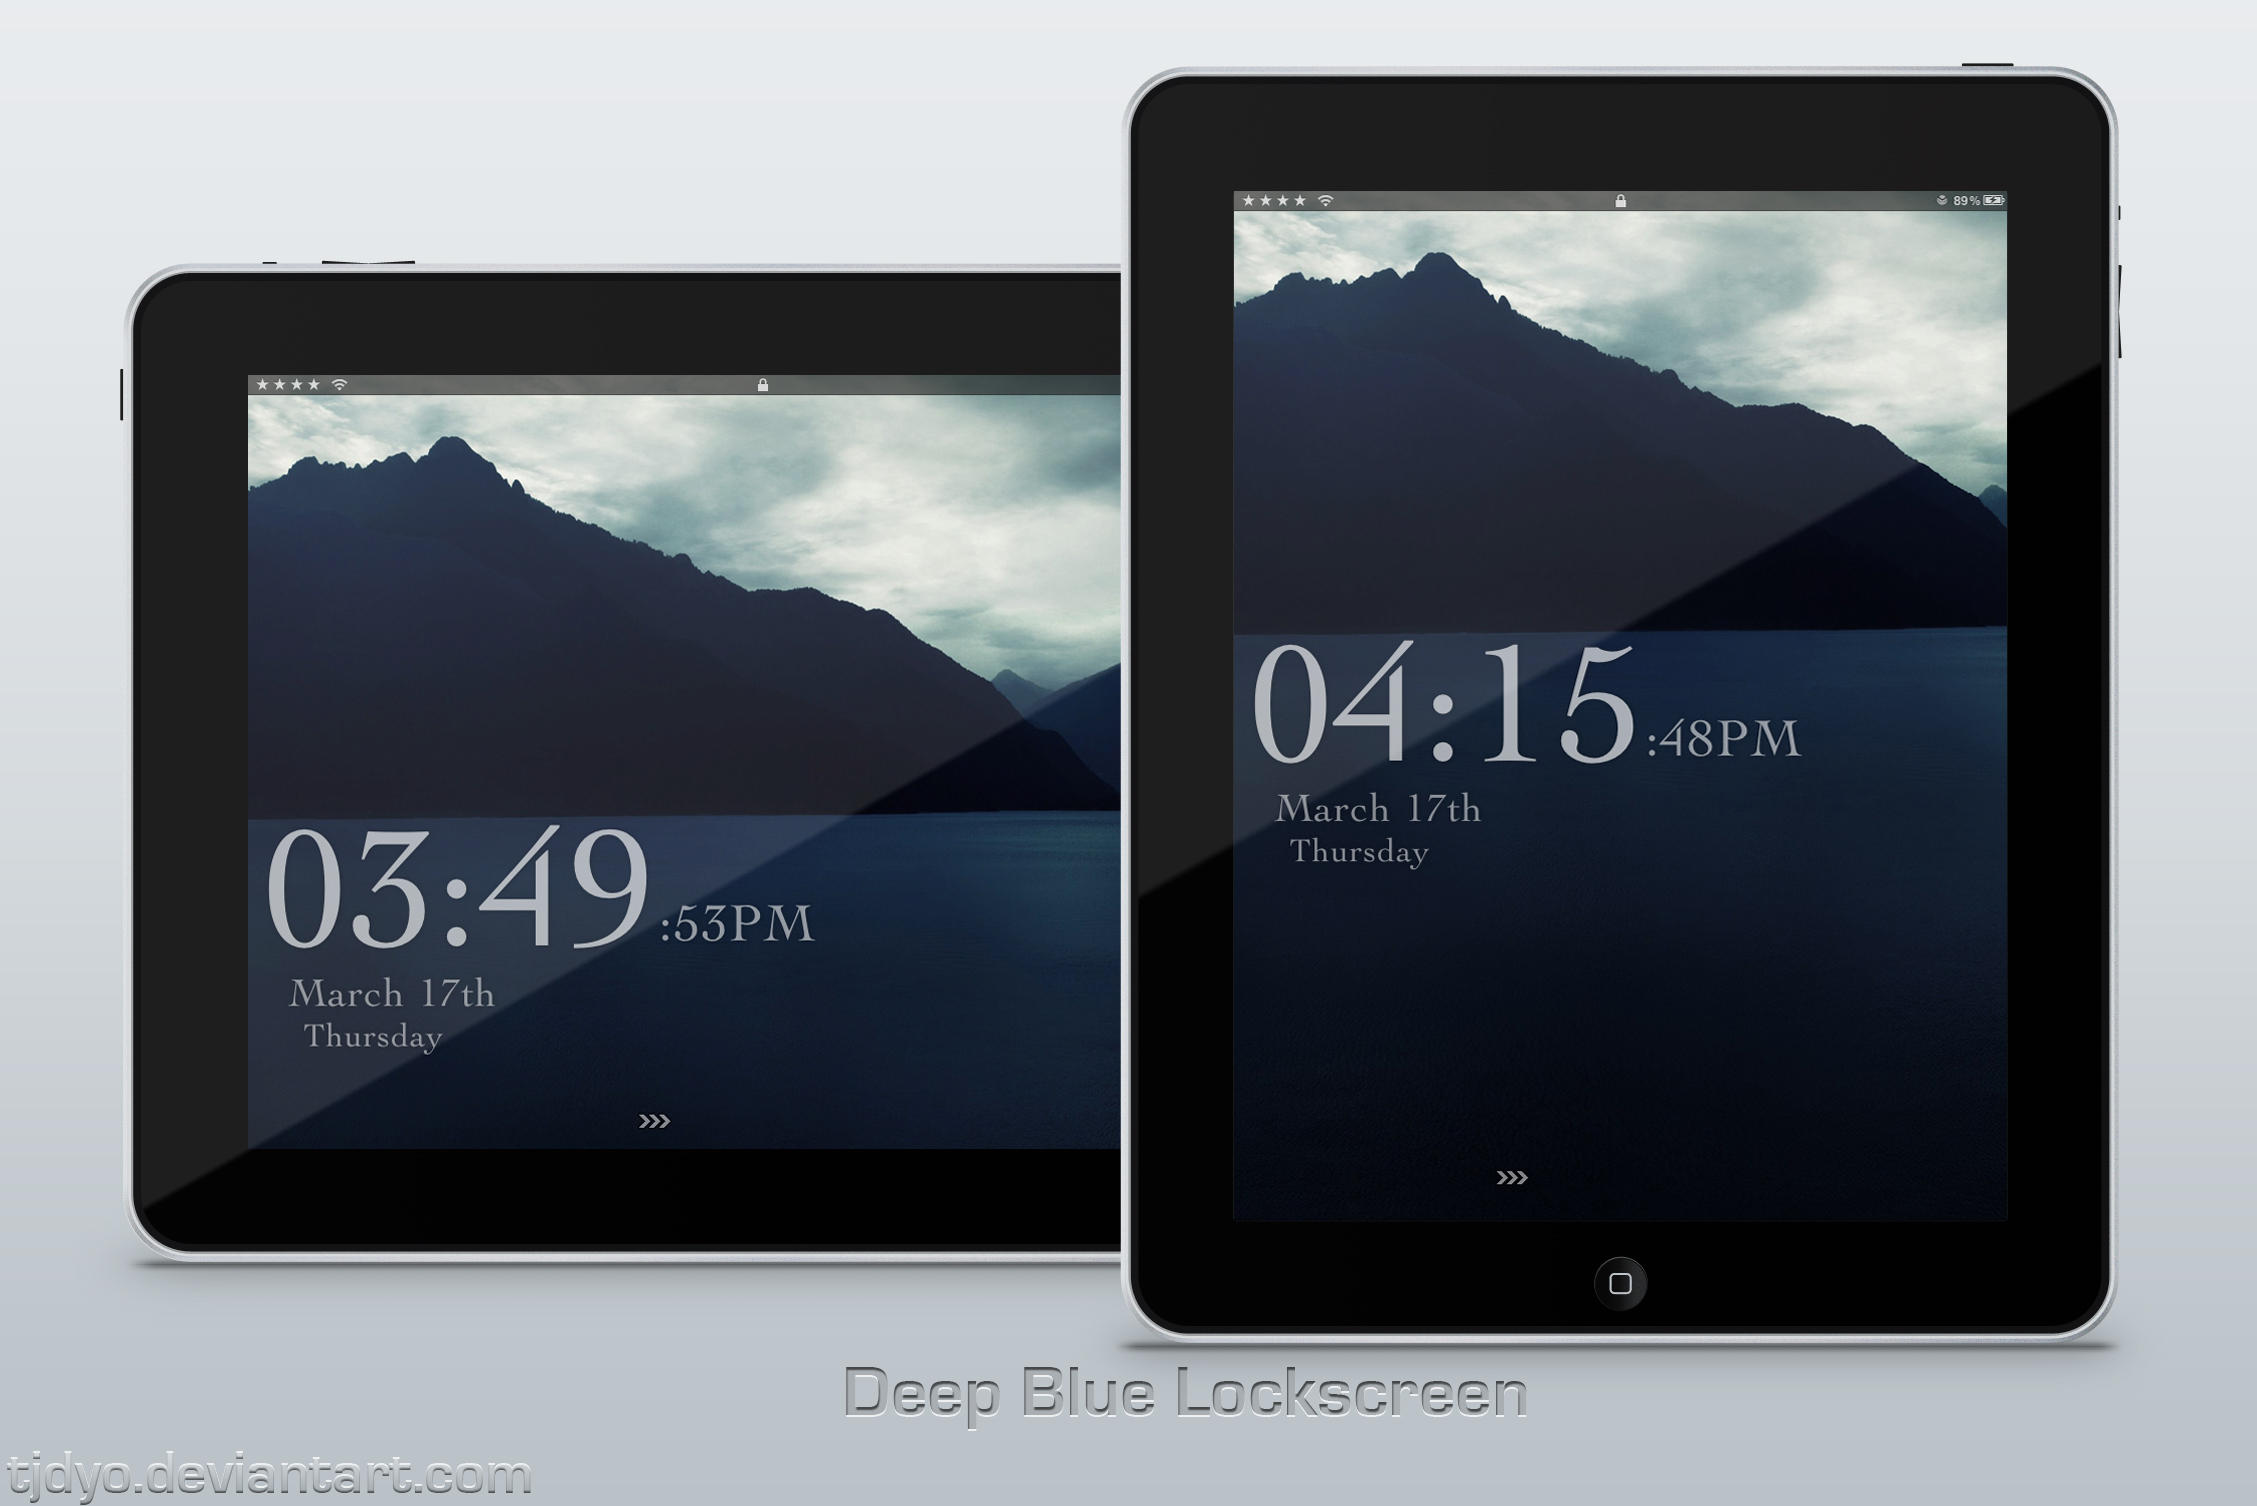 Deep Blue Lockscreen by Tjdyo